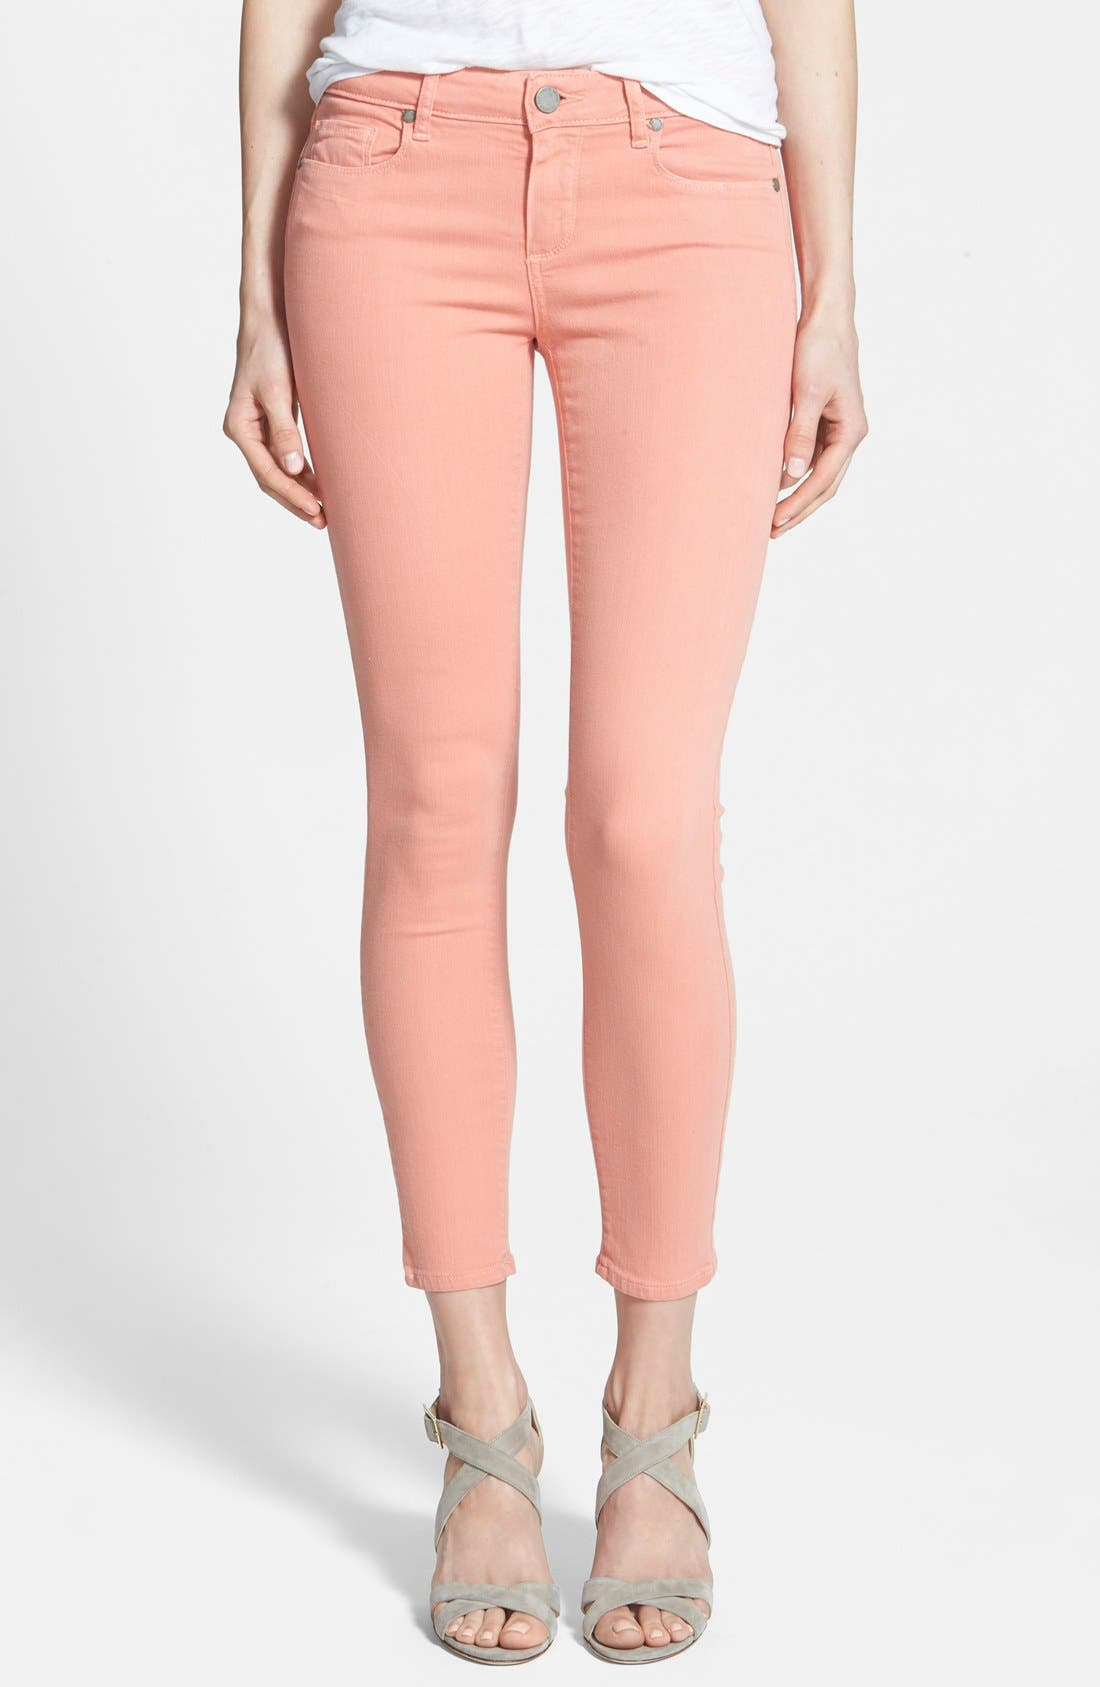 PAIGE Denim 'Verdugo' Ankle Super Skinny Jeans, Main, color, 650